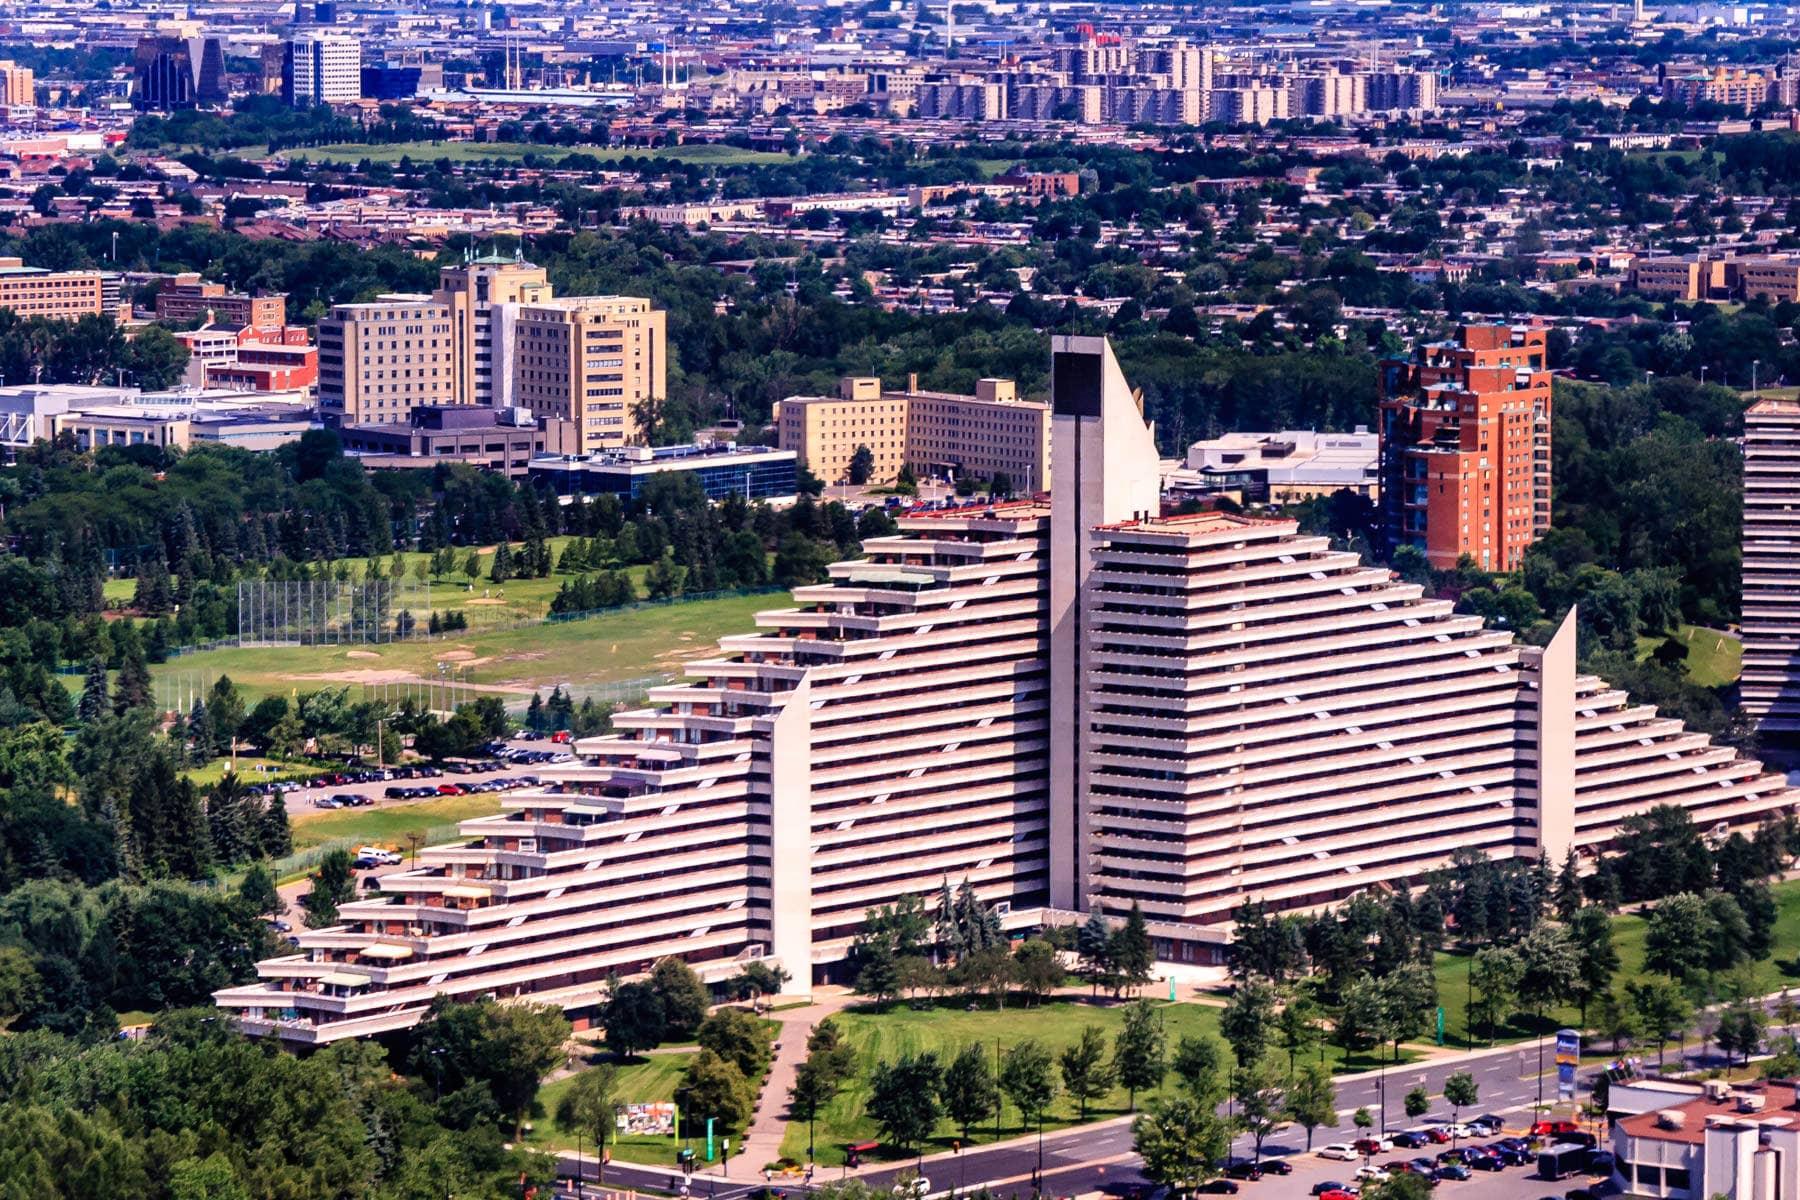 Montréal's Olympic Village, built for the 1976 olympics.